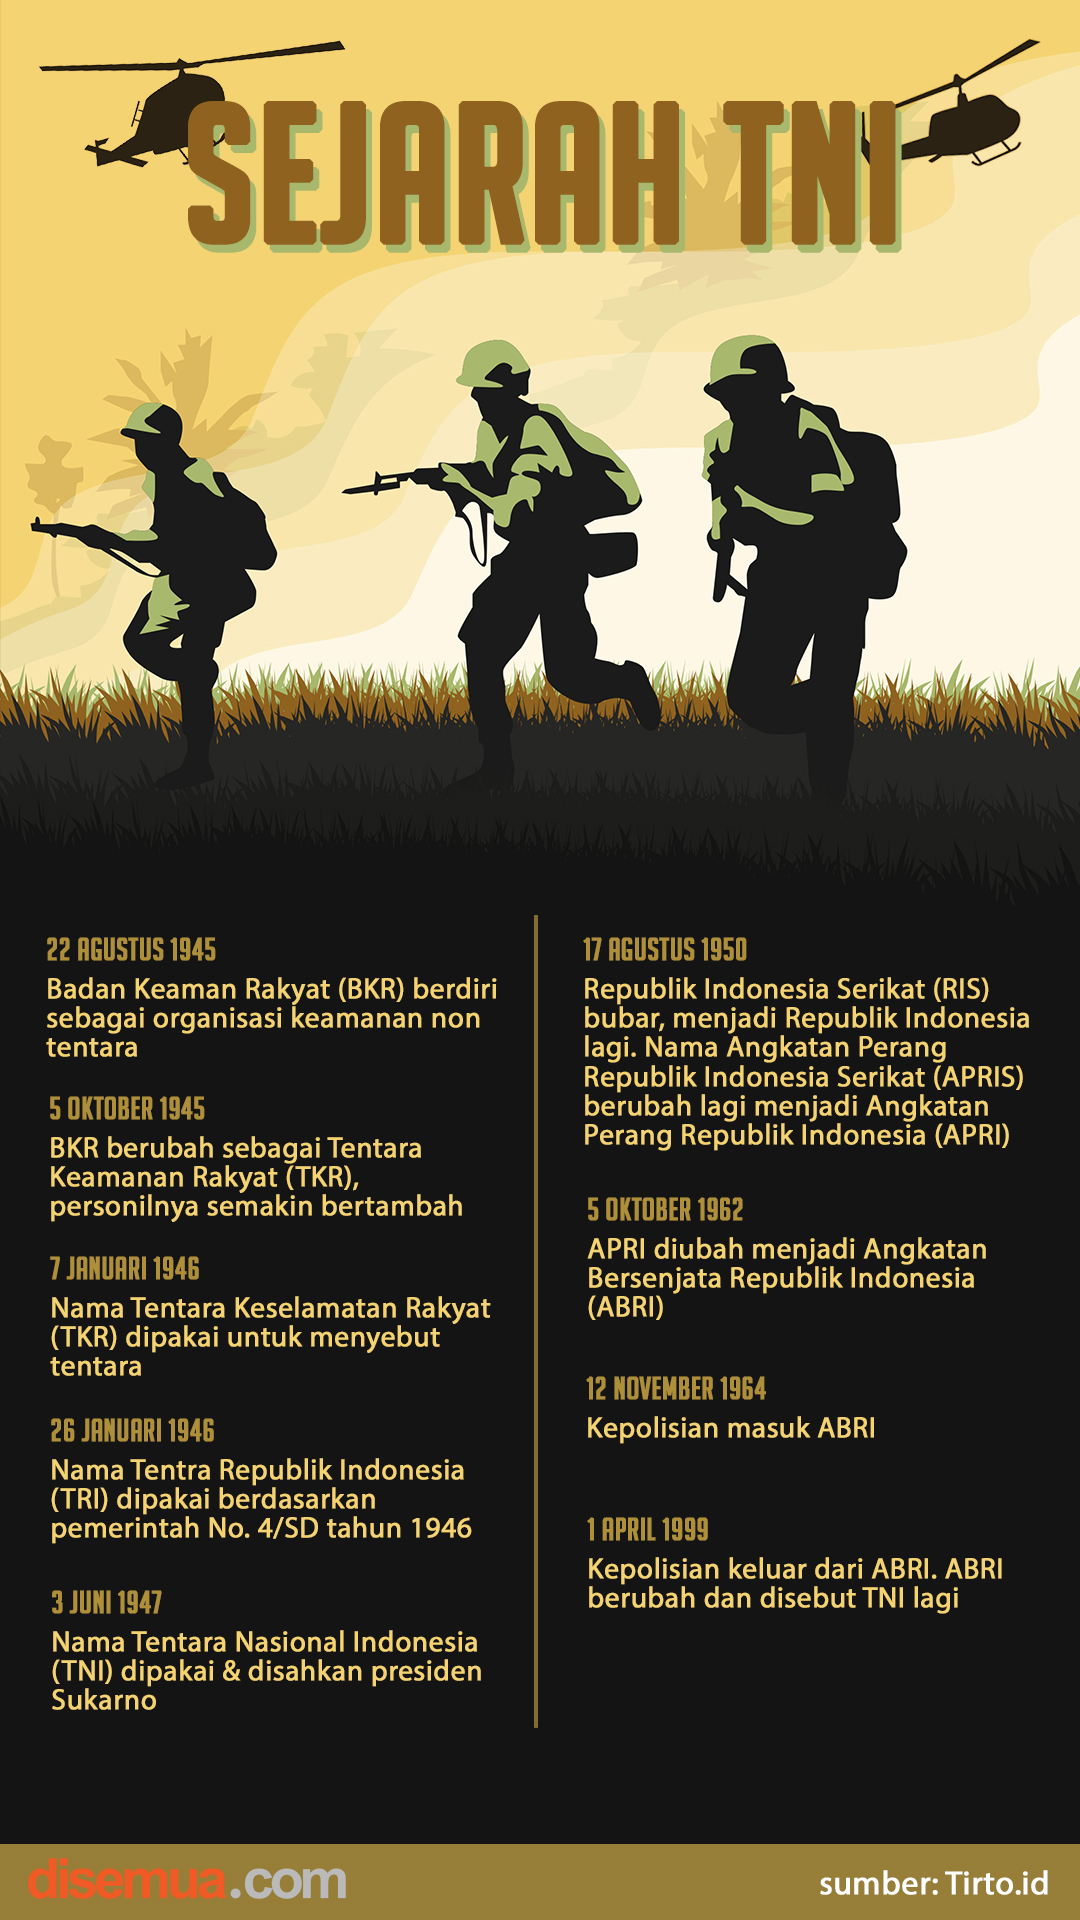 Sejarah TNI